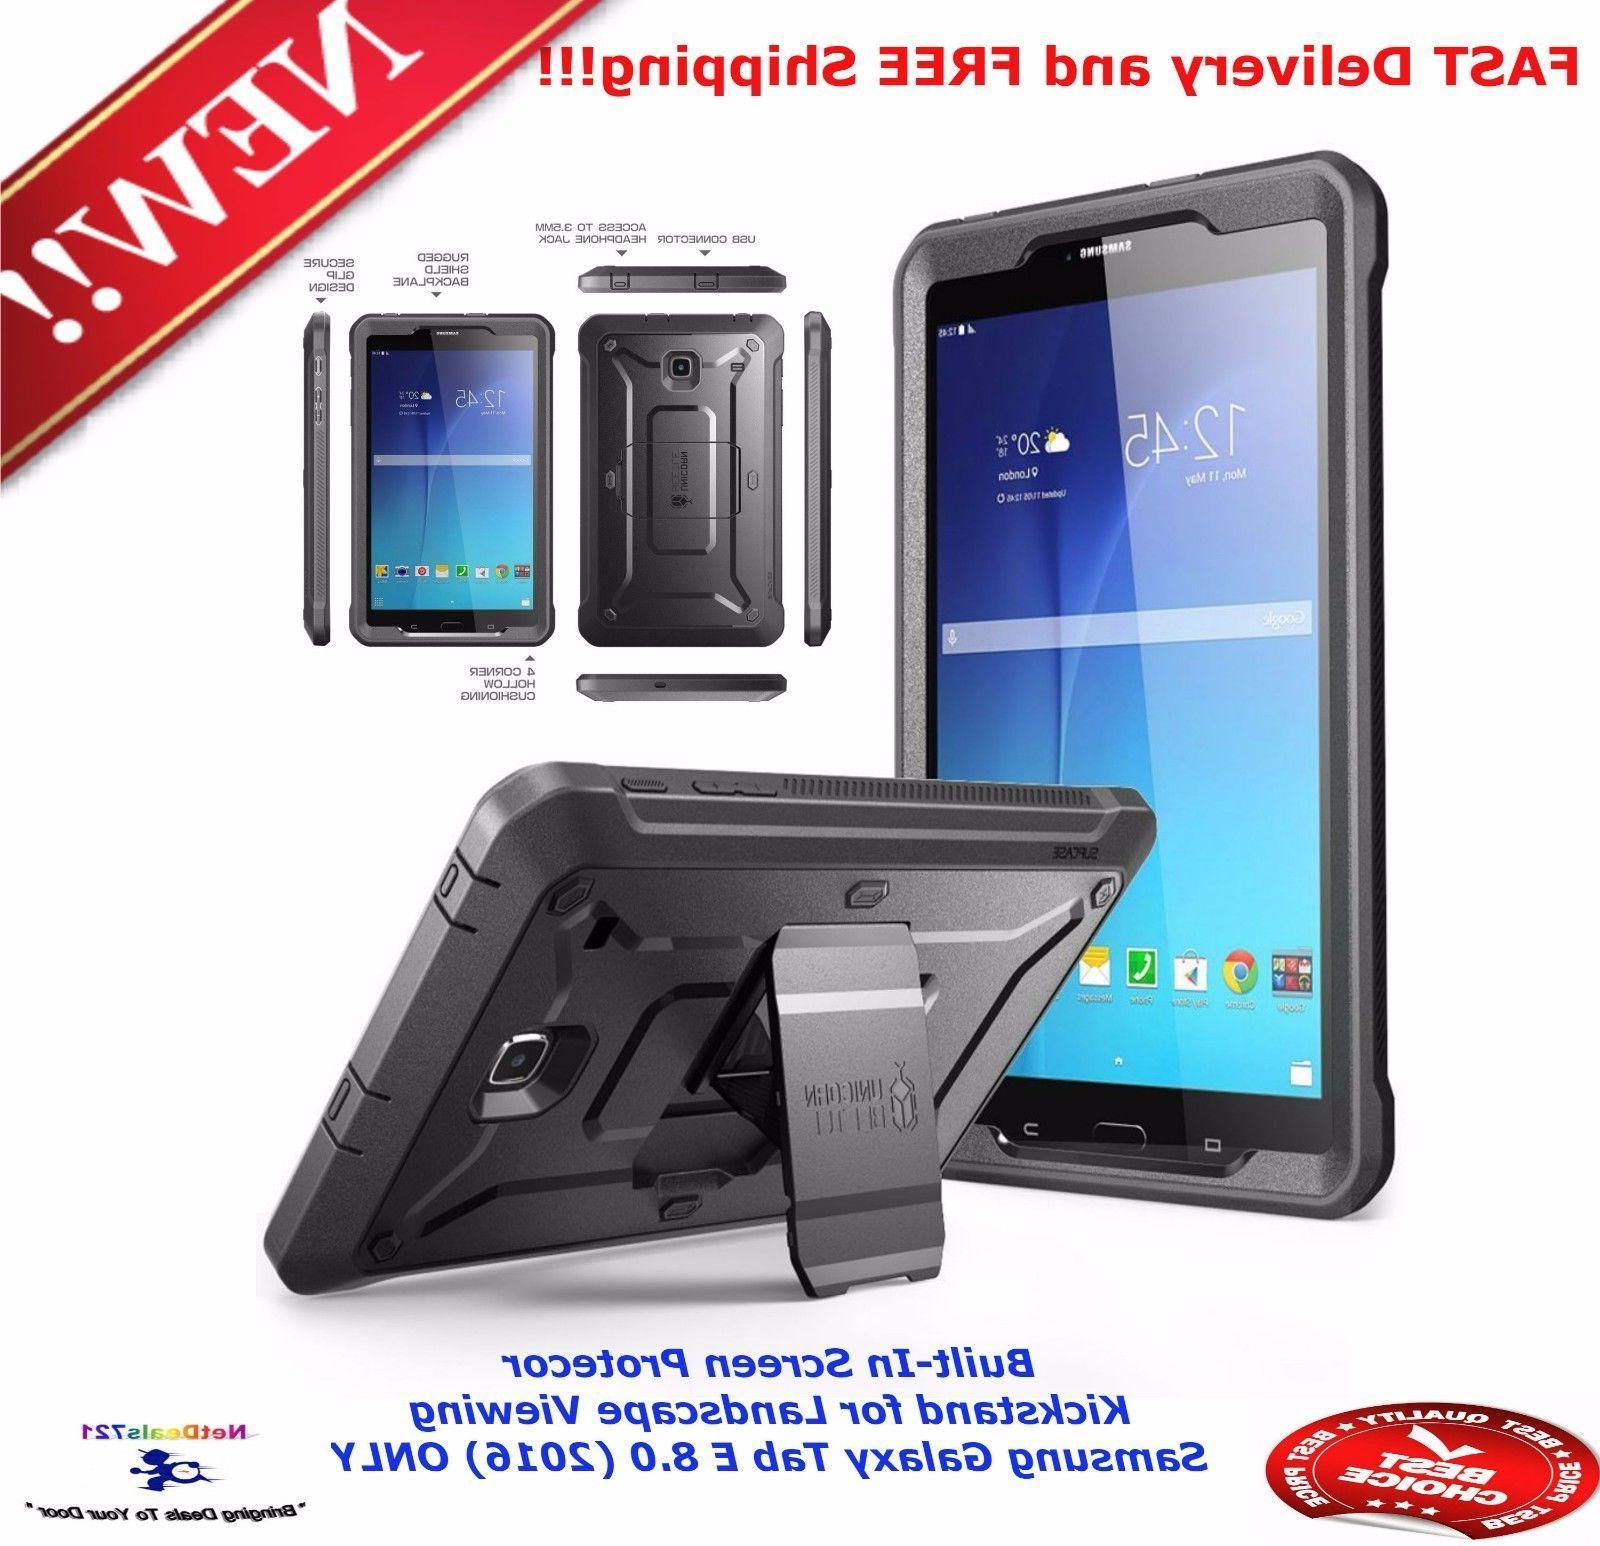 buy online c39fc cc7fb SUPCASE for Samsung Galaxy Tab E 8.0 Case.